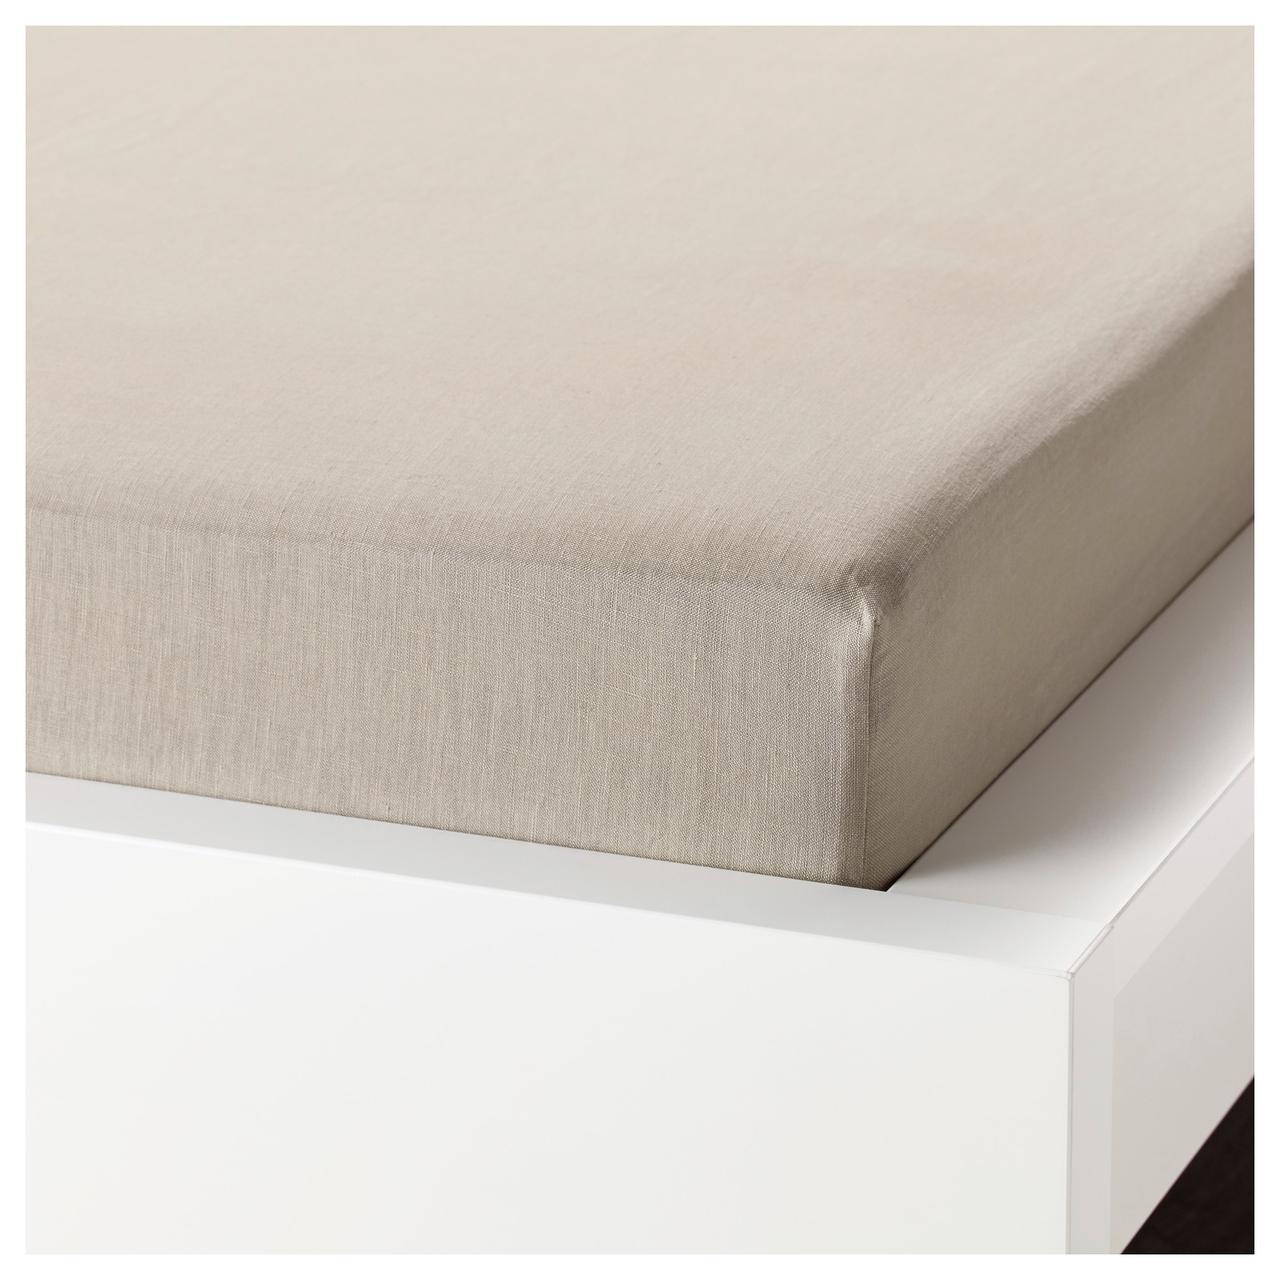 Простыня на резинке IKEA PUDERVIVA 140х200 натуральная 304.066.64